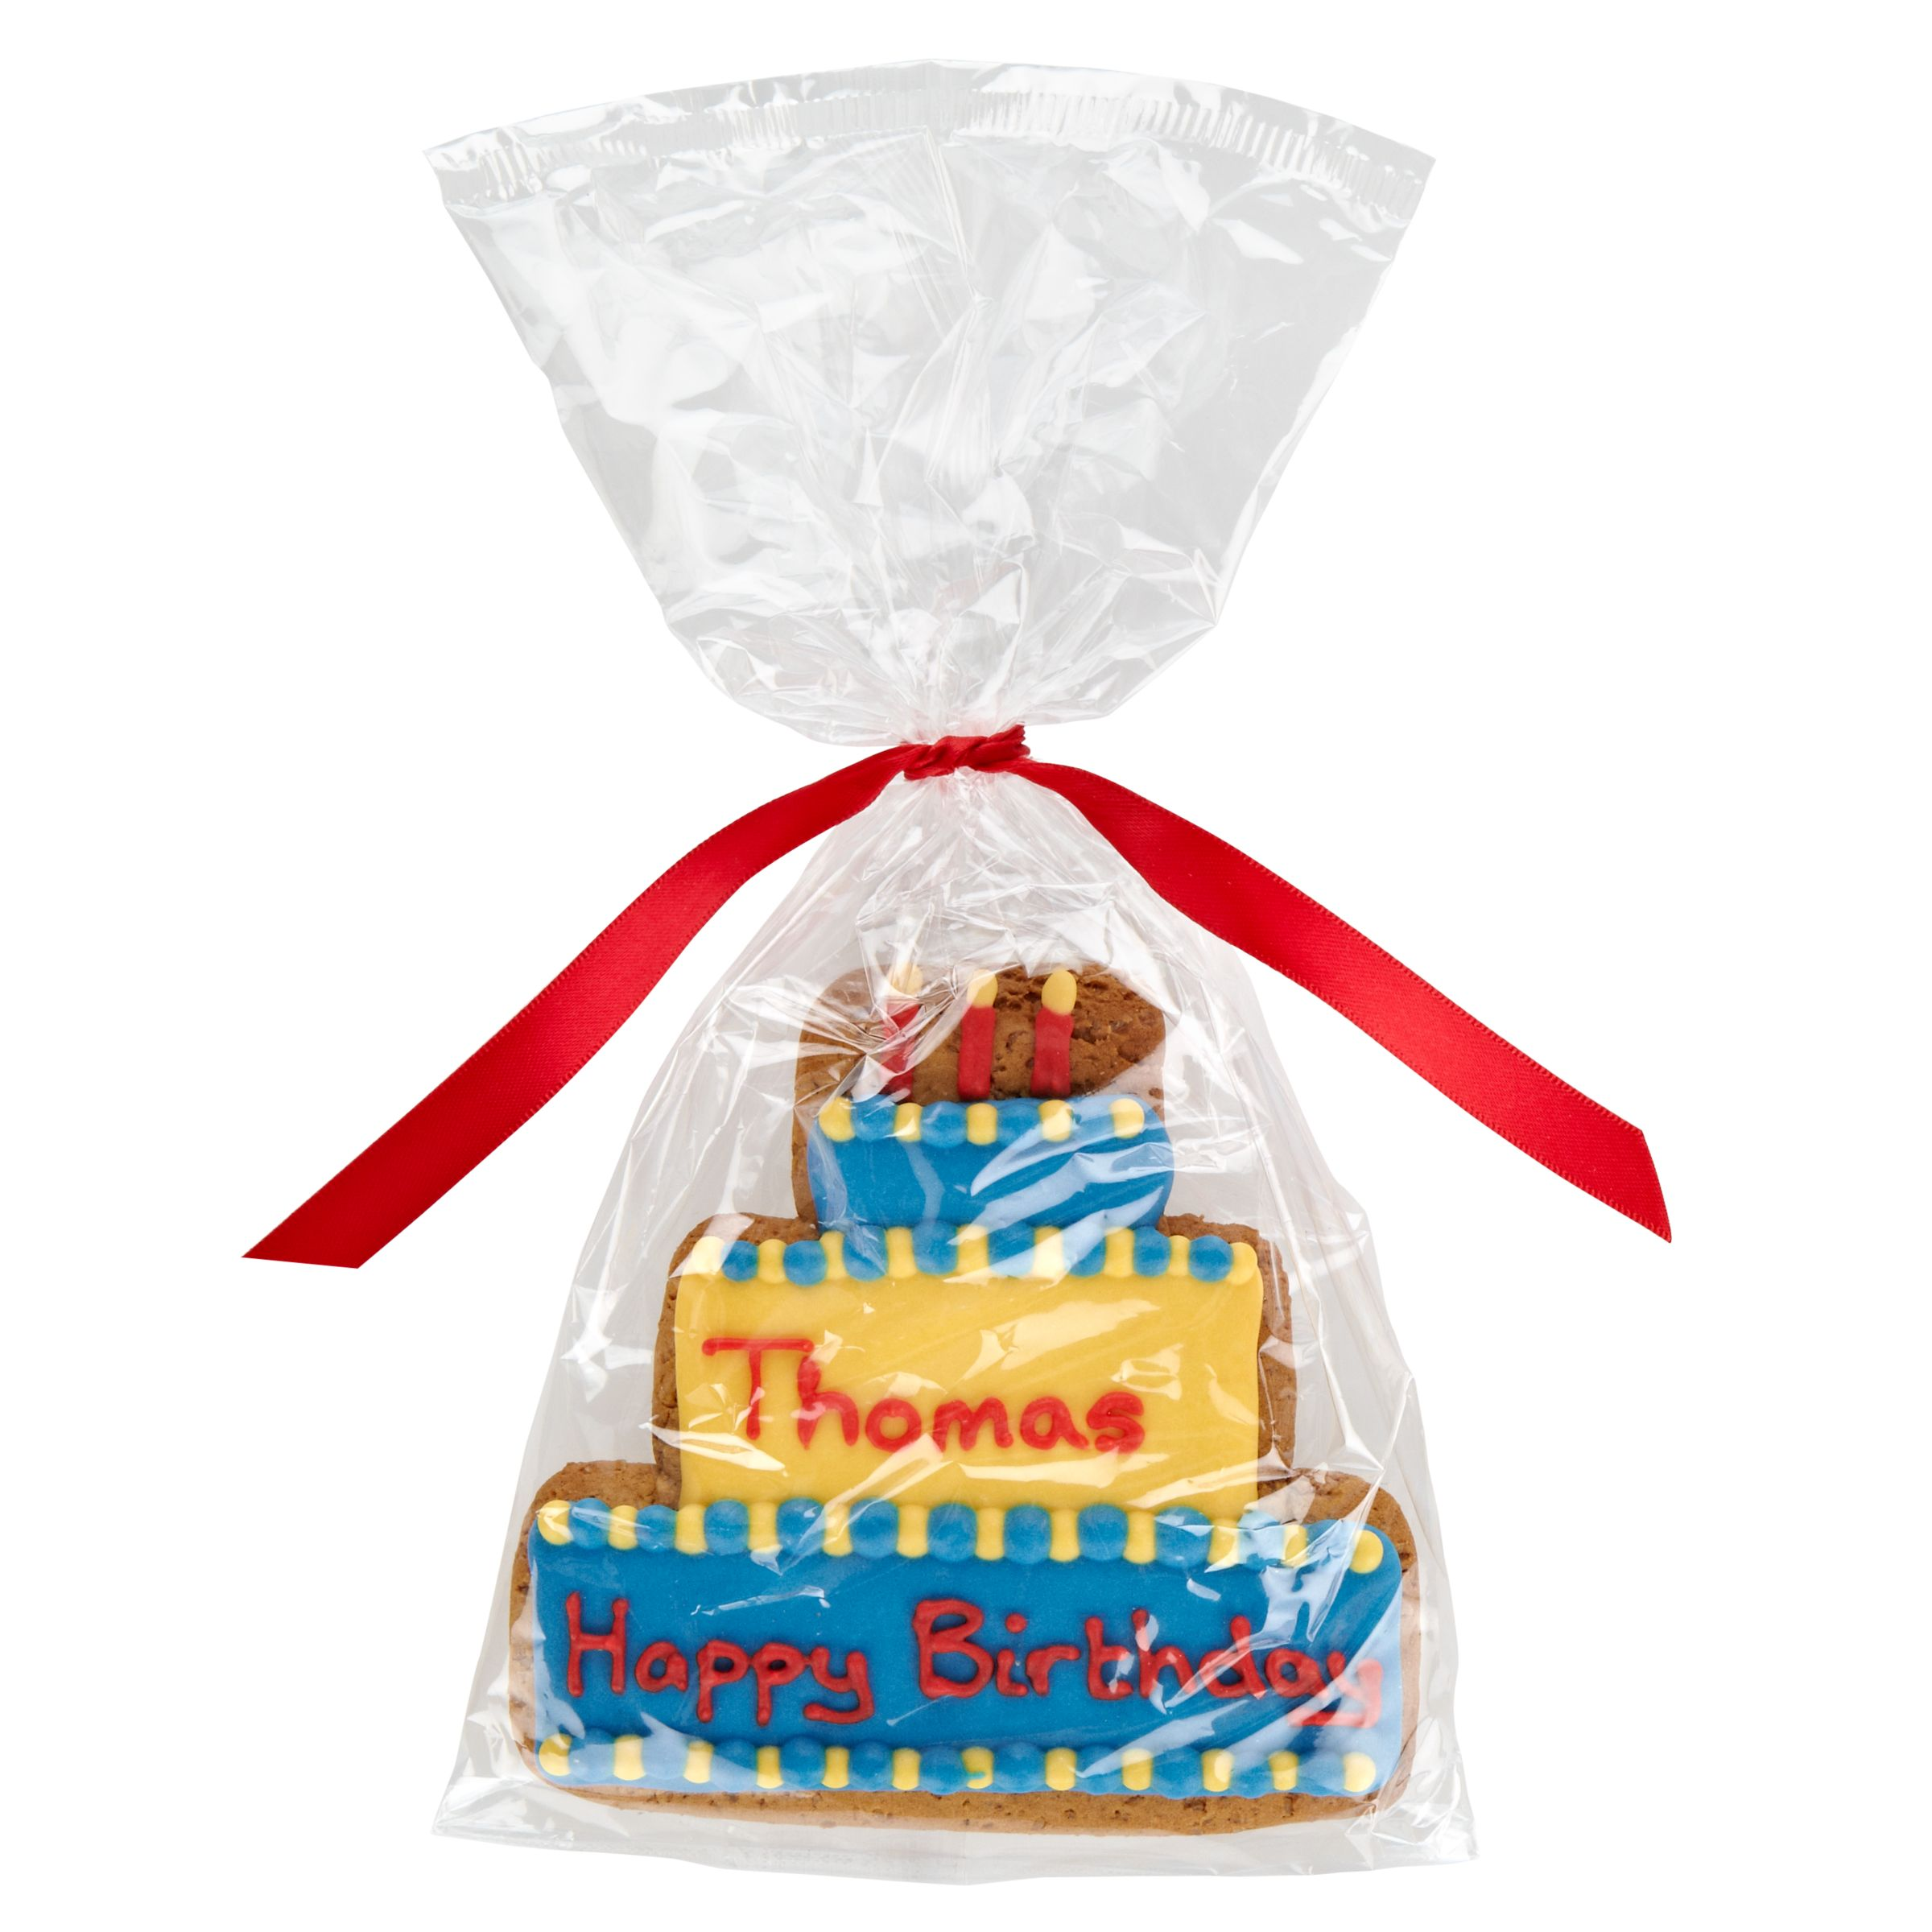 Birthday Cake John Lewis : Buy Image on Food Personalised Happy Birthday Cake Boy ...